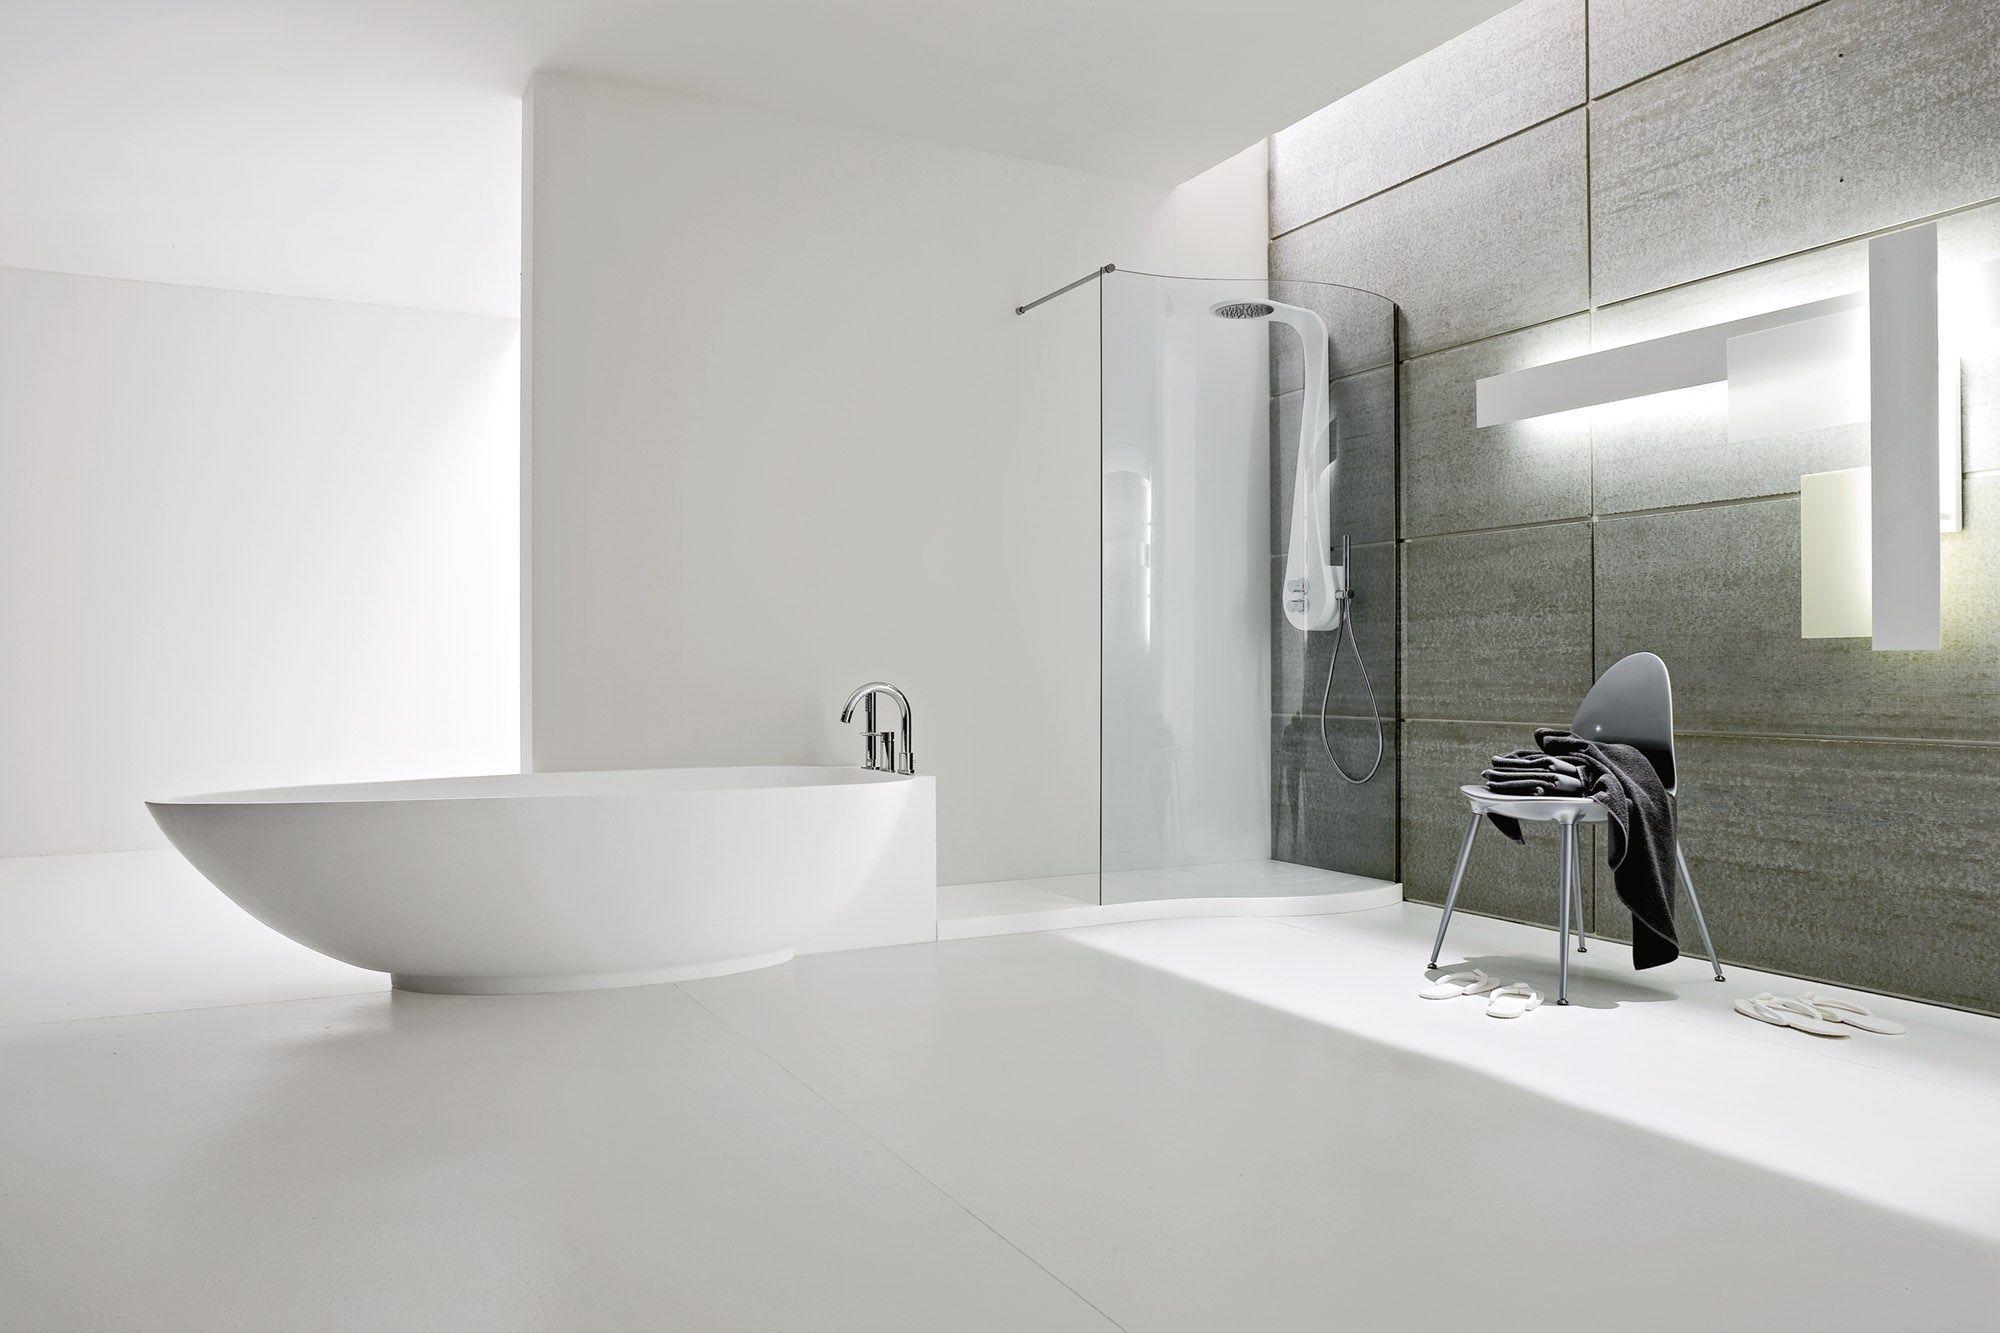 Vasca Da Bagno Angolare Economica : Boma vasca da bagno angolare by rexa design design imago vasca da